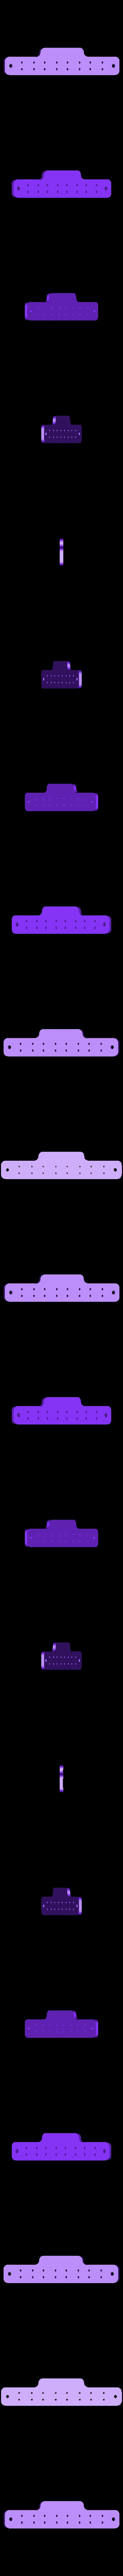 boomypi-button-pcb.stl Download free STL file Raspberry Pi Airplay BoomBox • 3D printer template, Adafruit